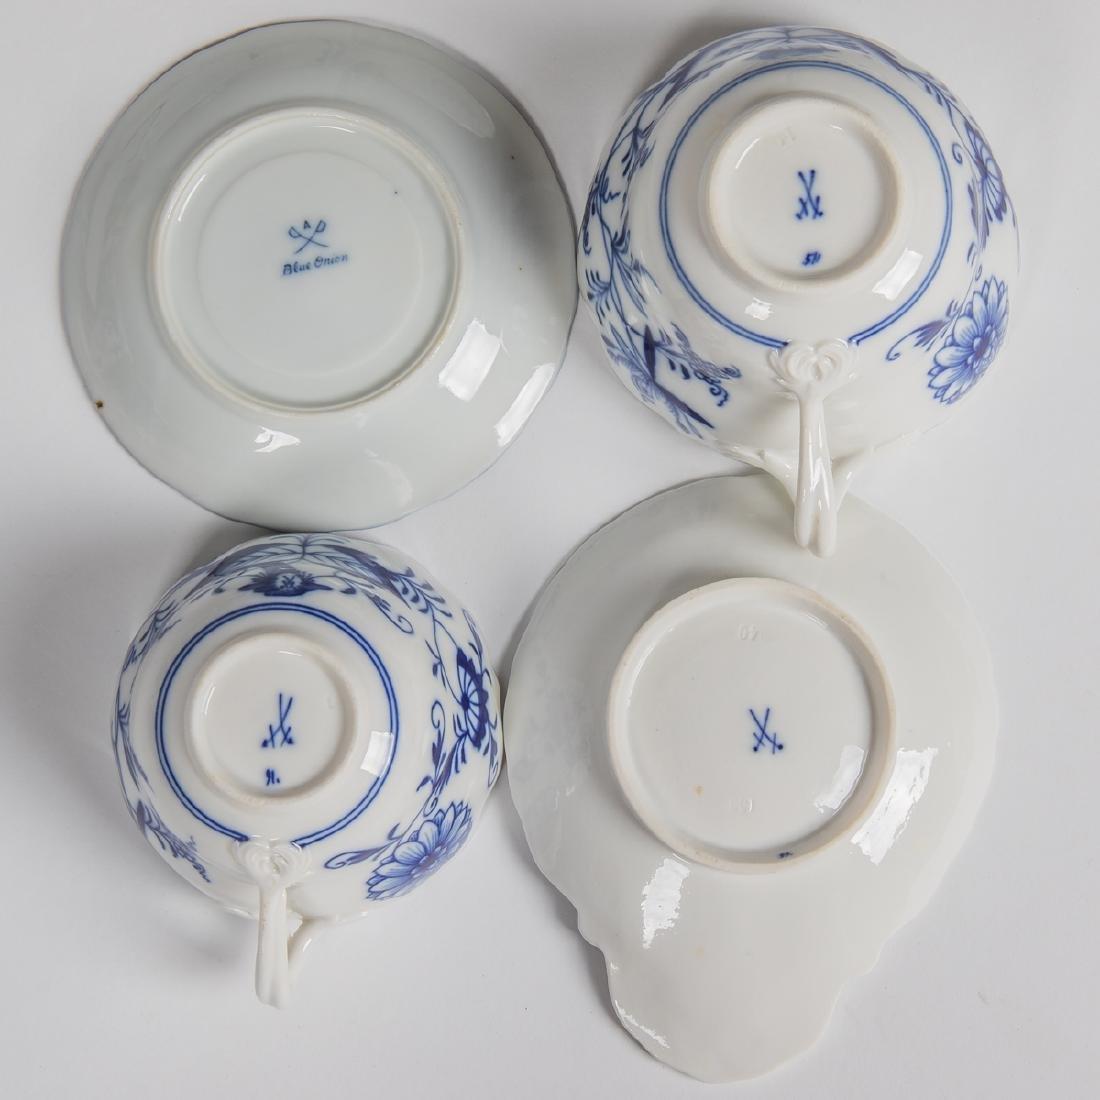 A Meissen Porcelain Dinner Service in the Blue Onion - 10